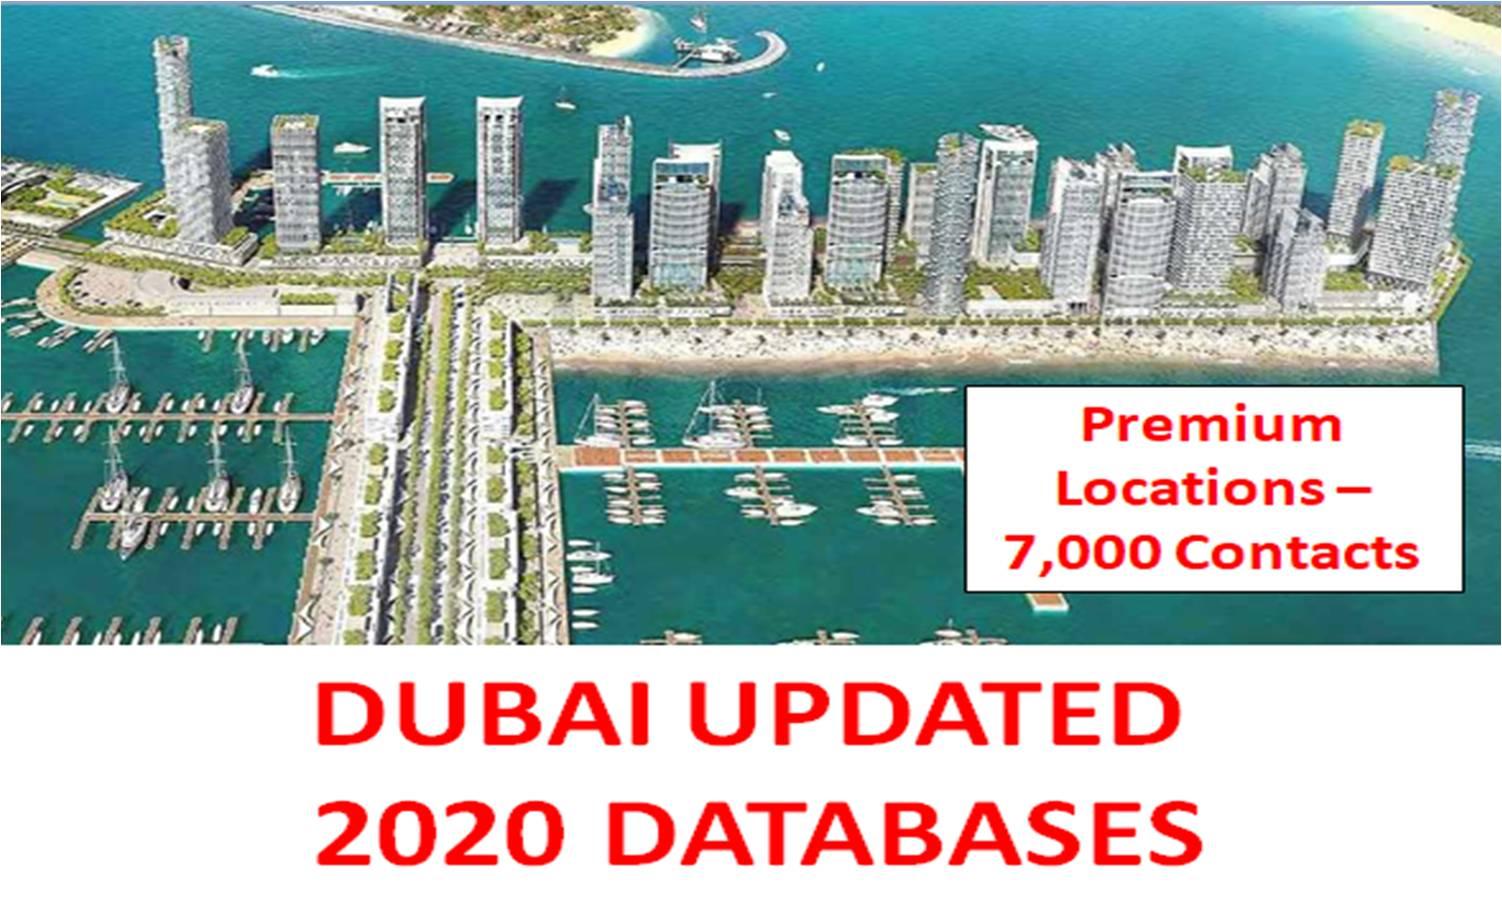 Dubai 2020 Databases